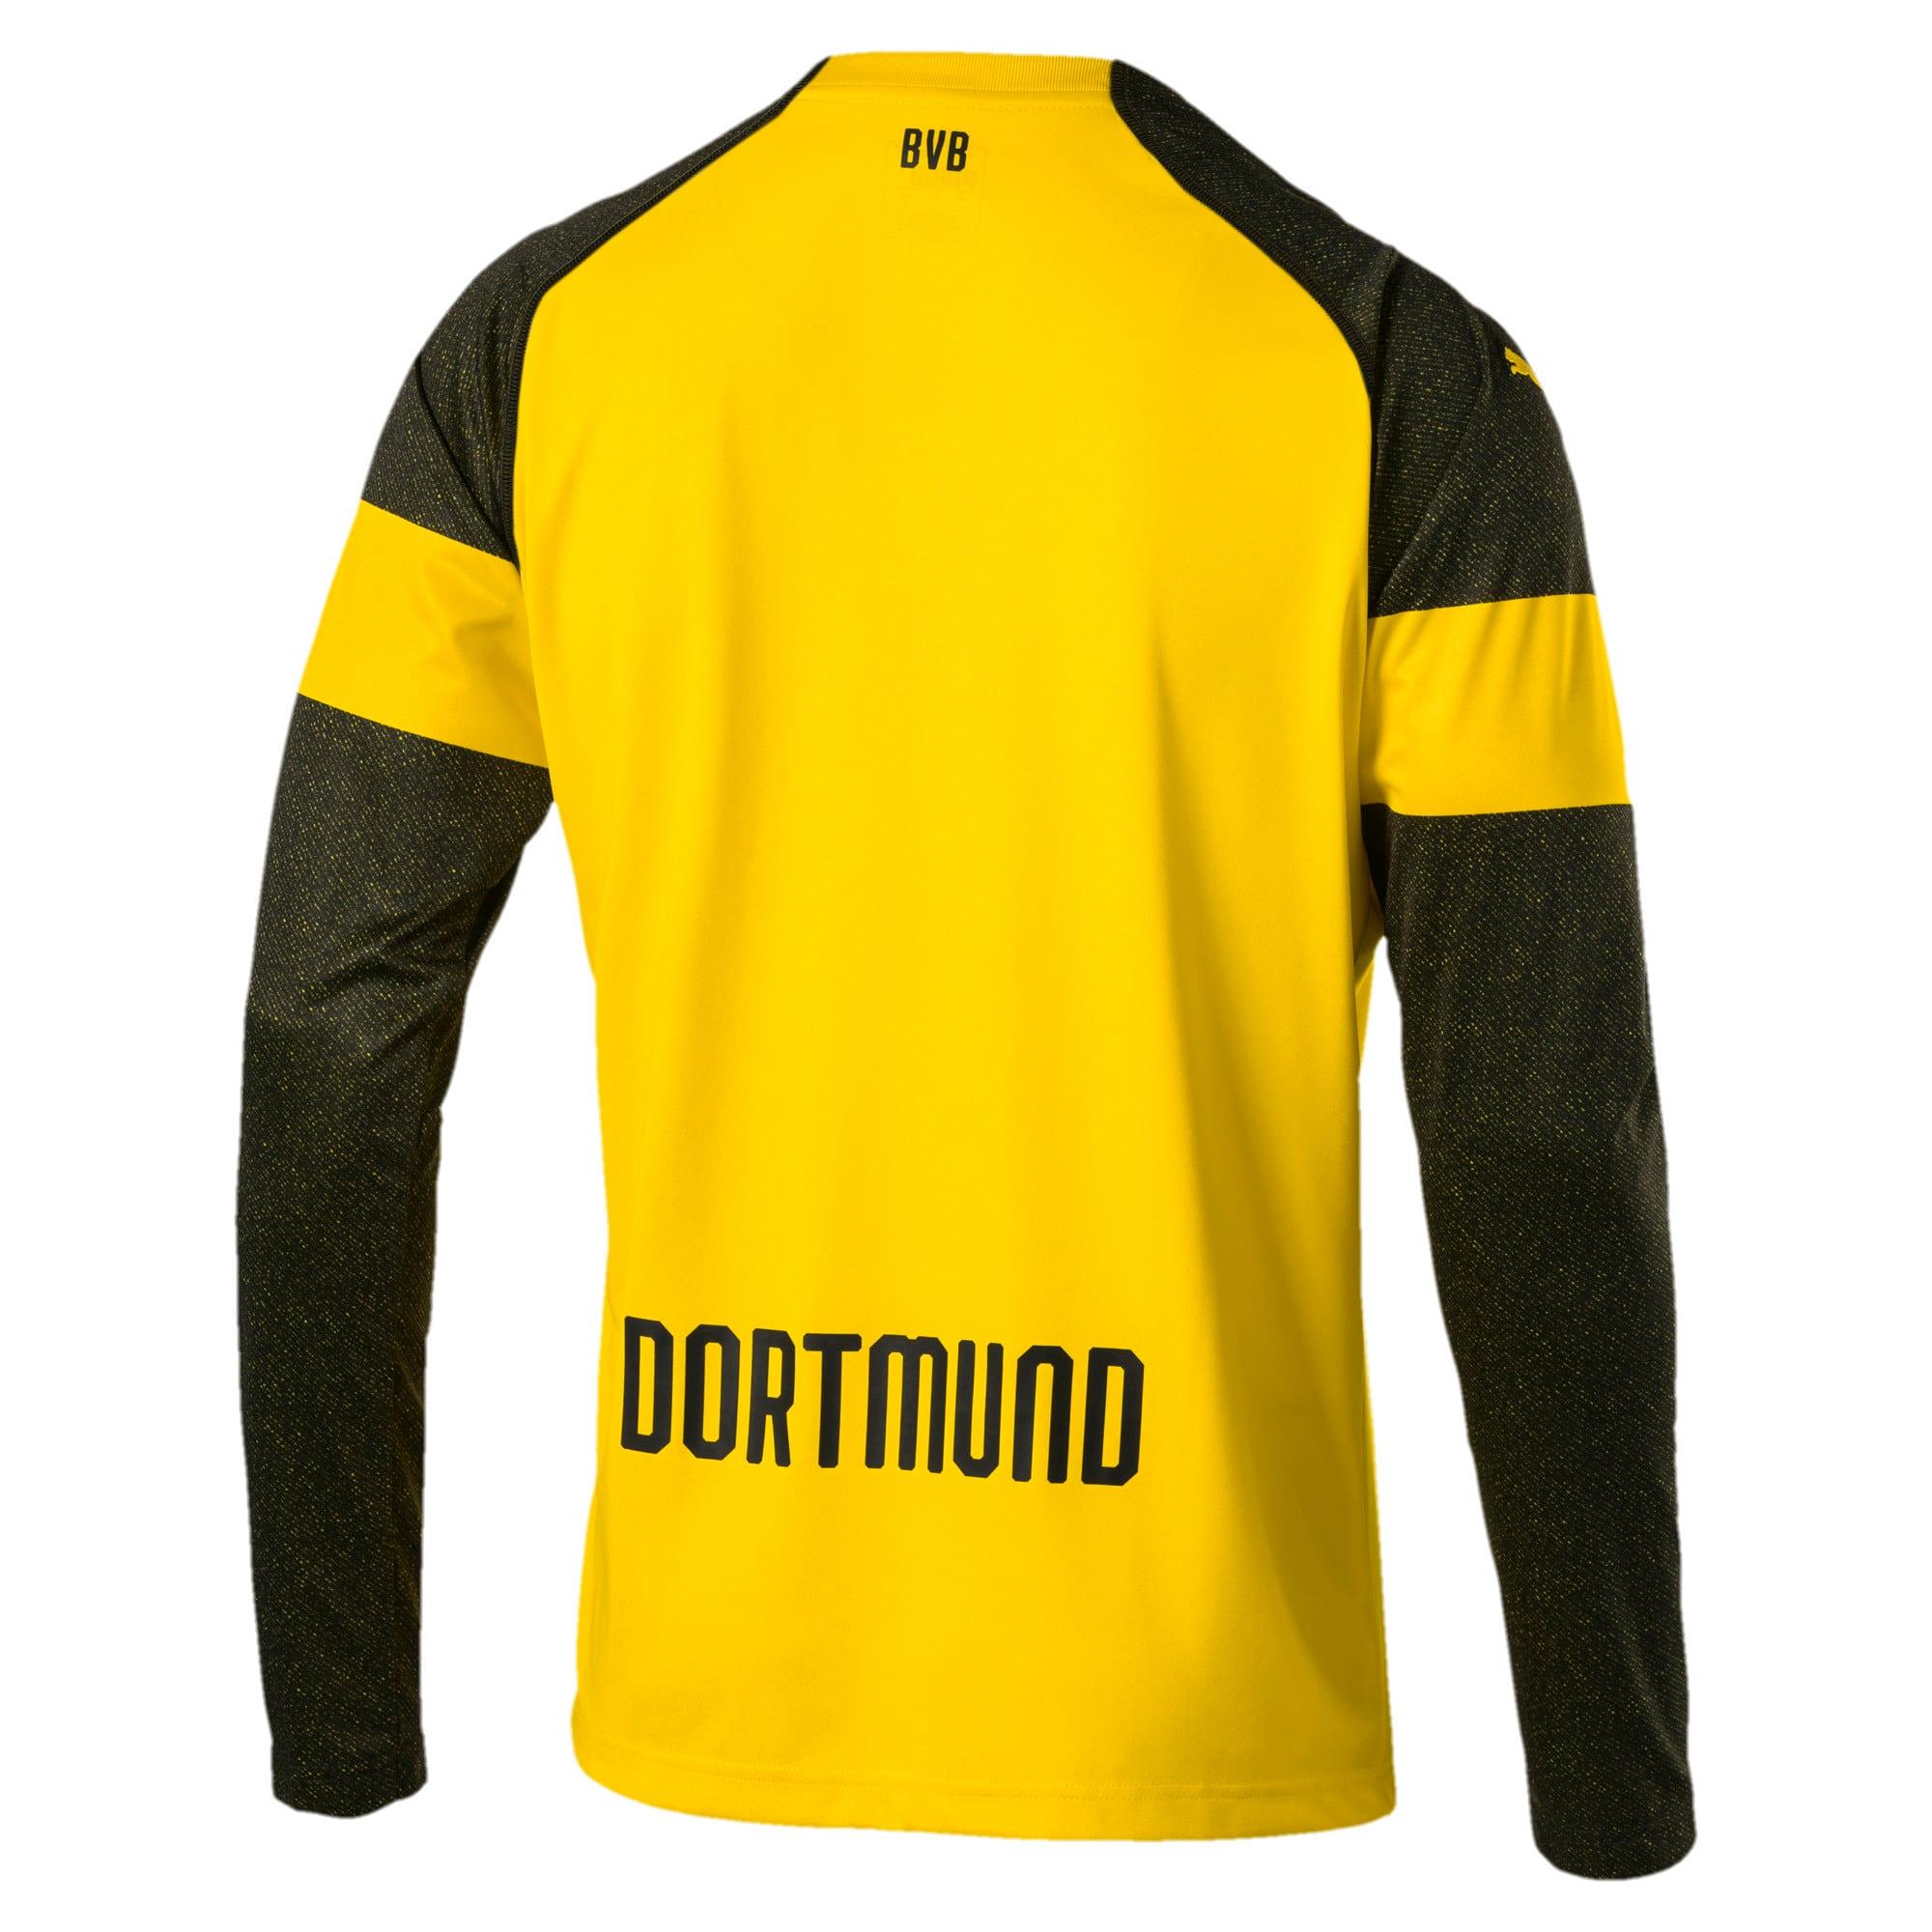 Thumbnail 3 of BVB LS ホーム レプリカシャツ, Cyber Yellow, medium-JPN